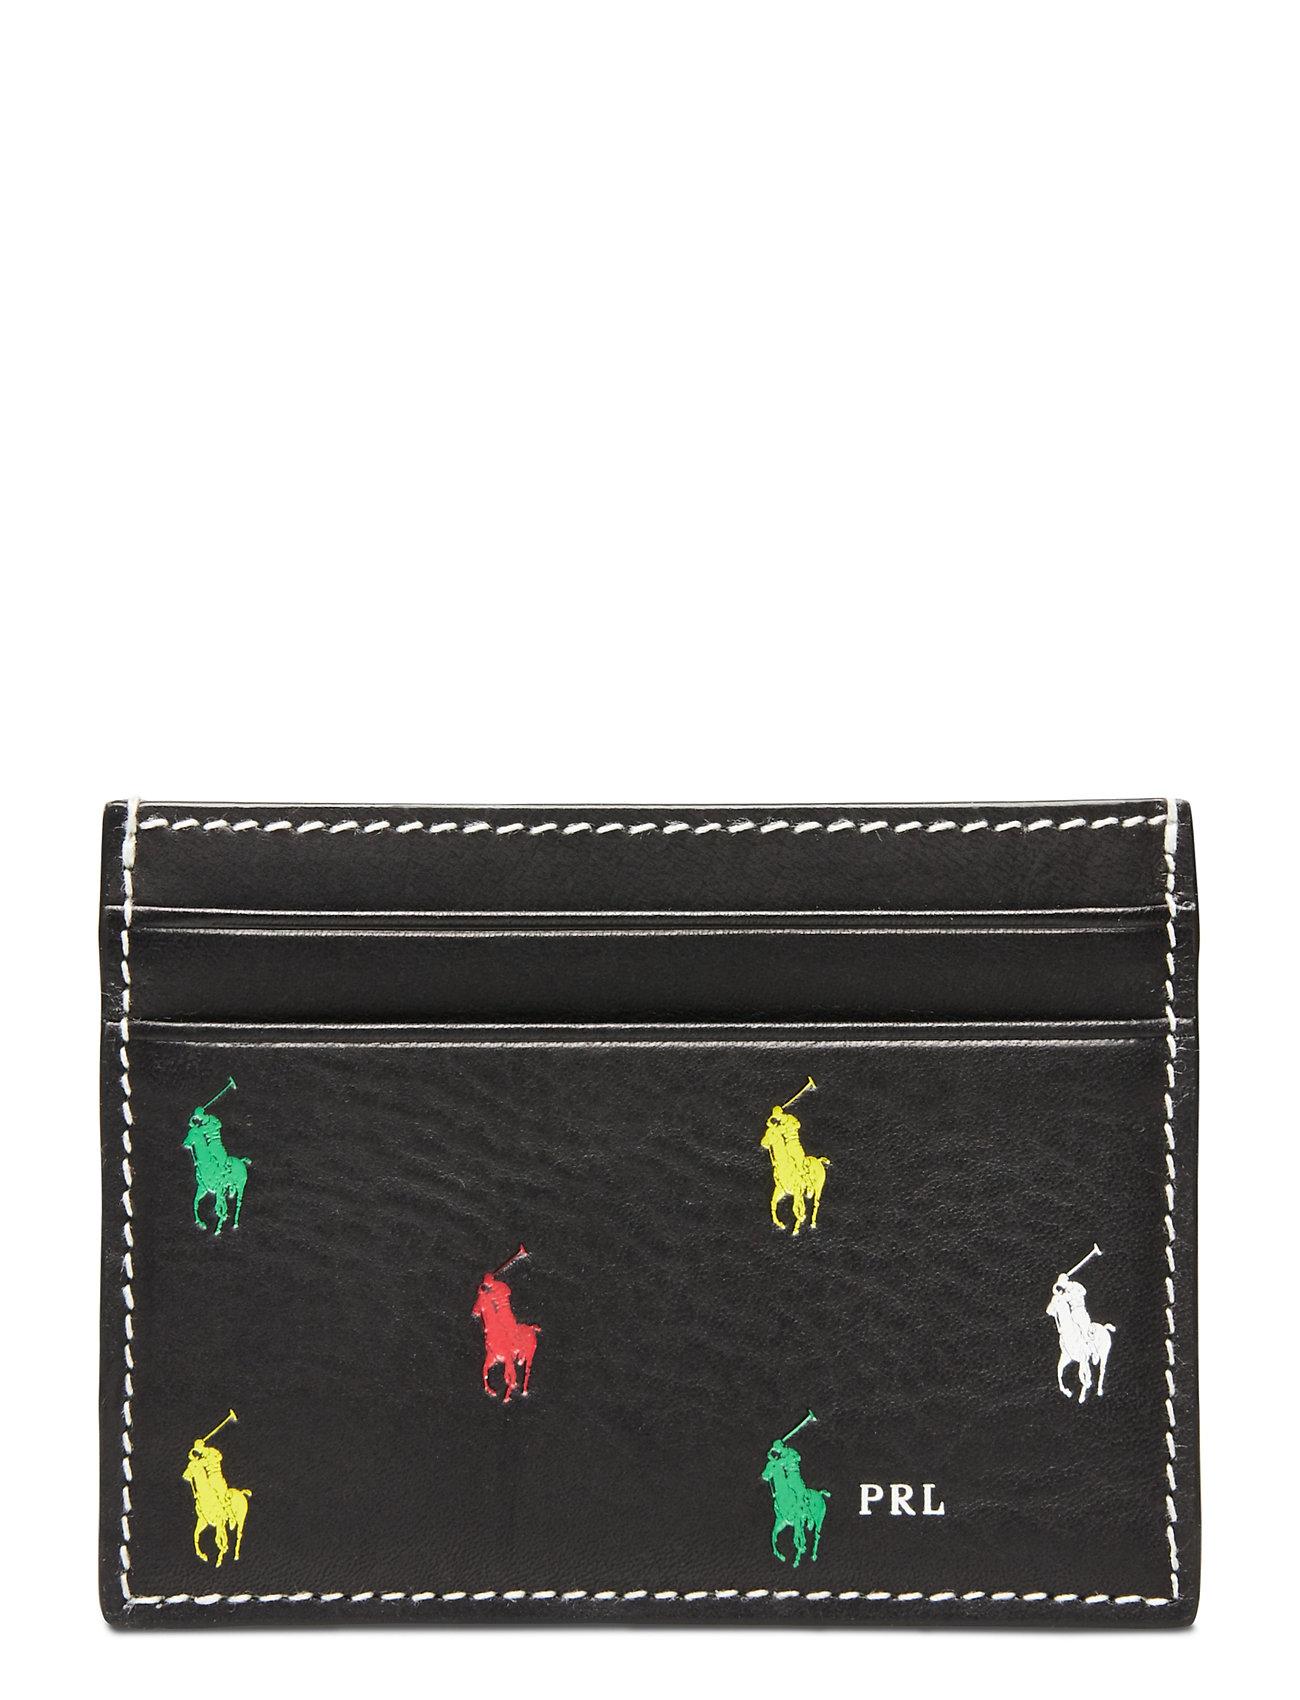 Polo Ralph Lauren Leather Pony Card Case - BLACK MULTI